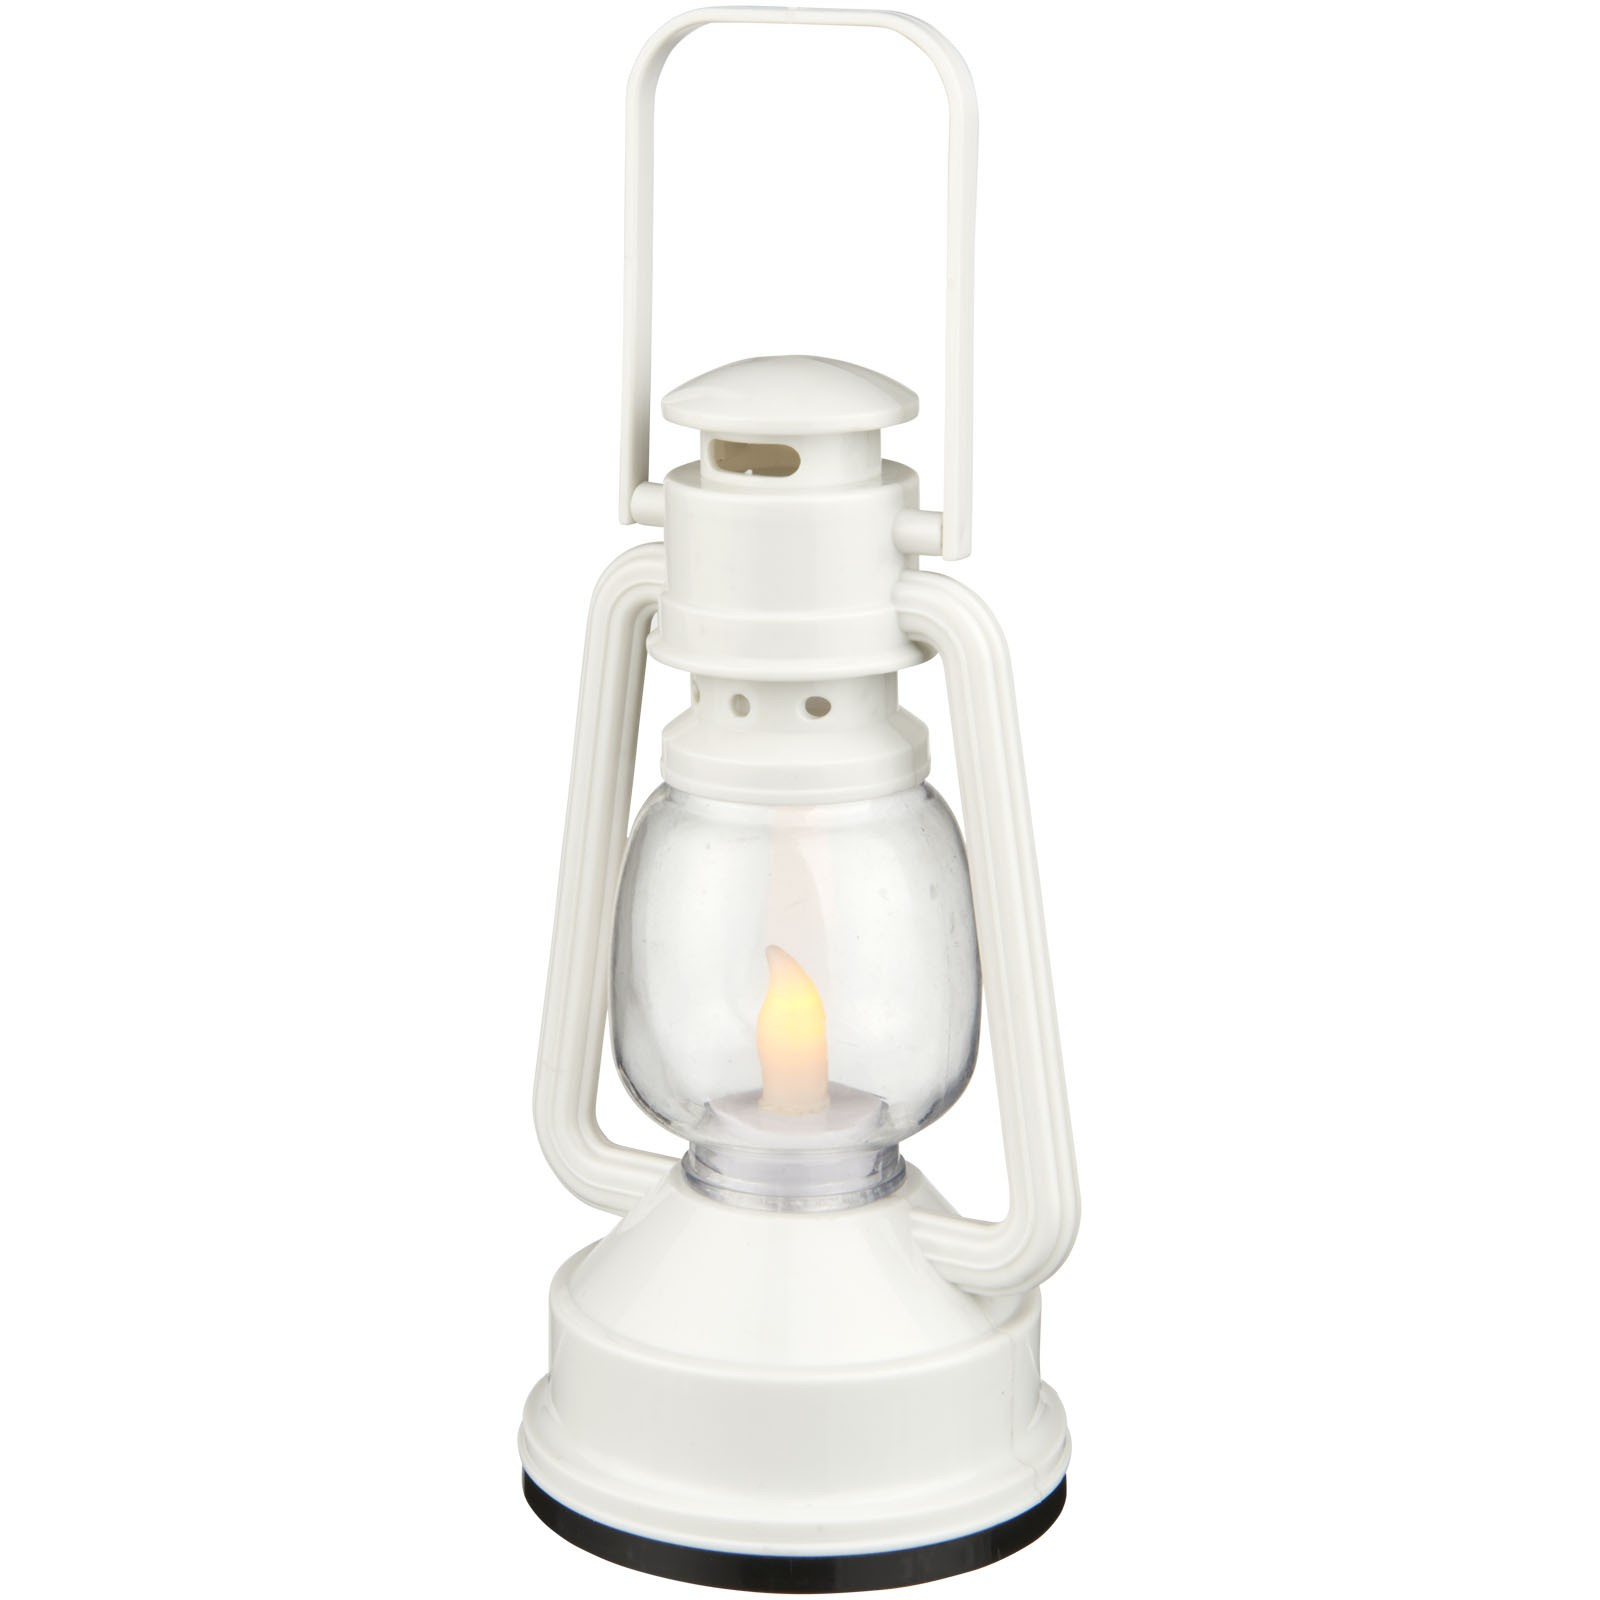 Emerald LED lantern light - White